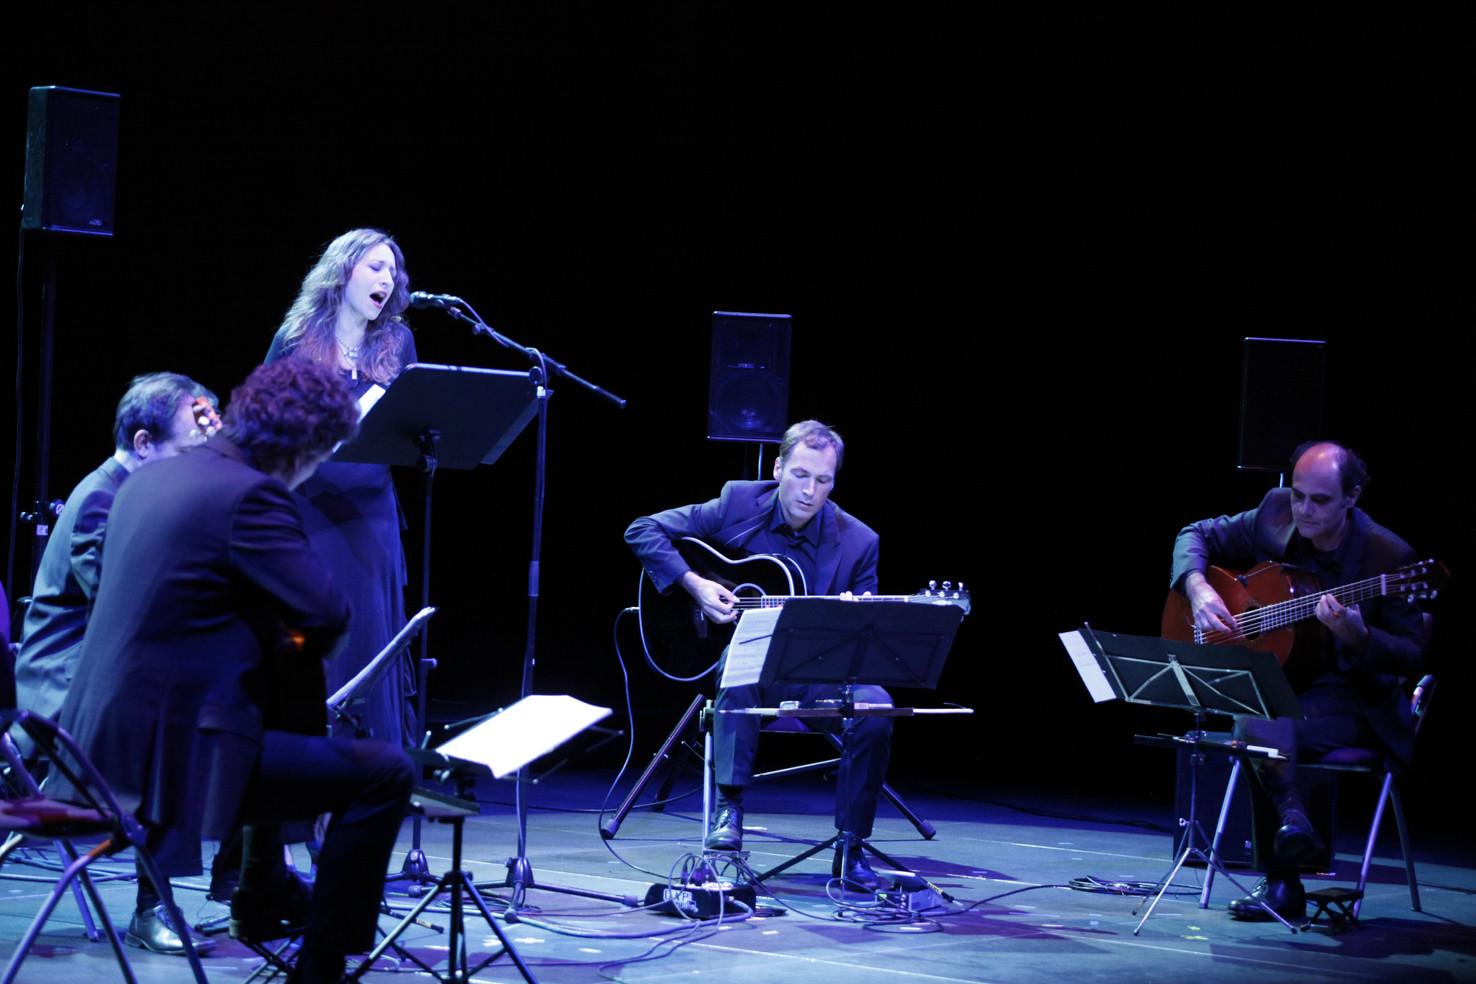 Graz concert with Daisy Press Musikproto